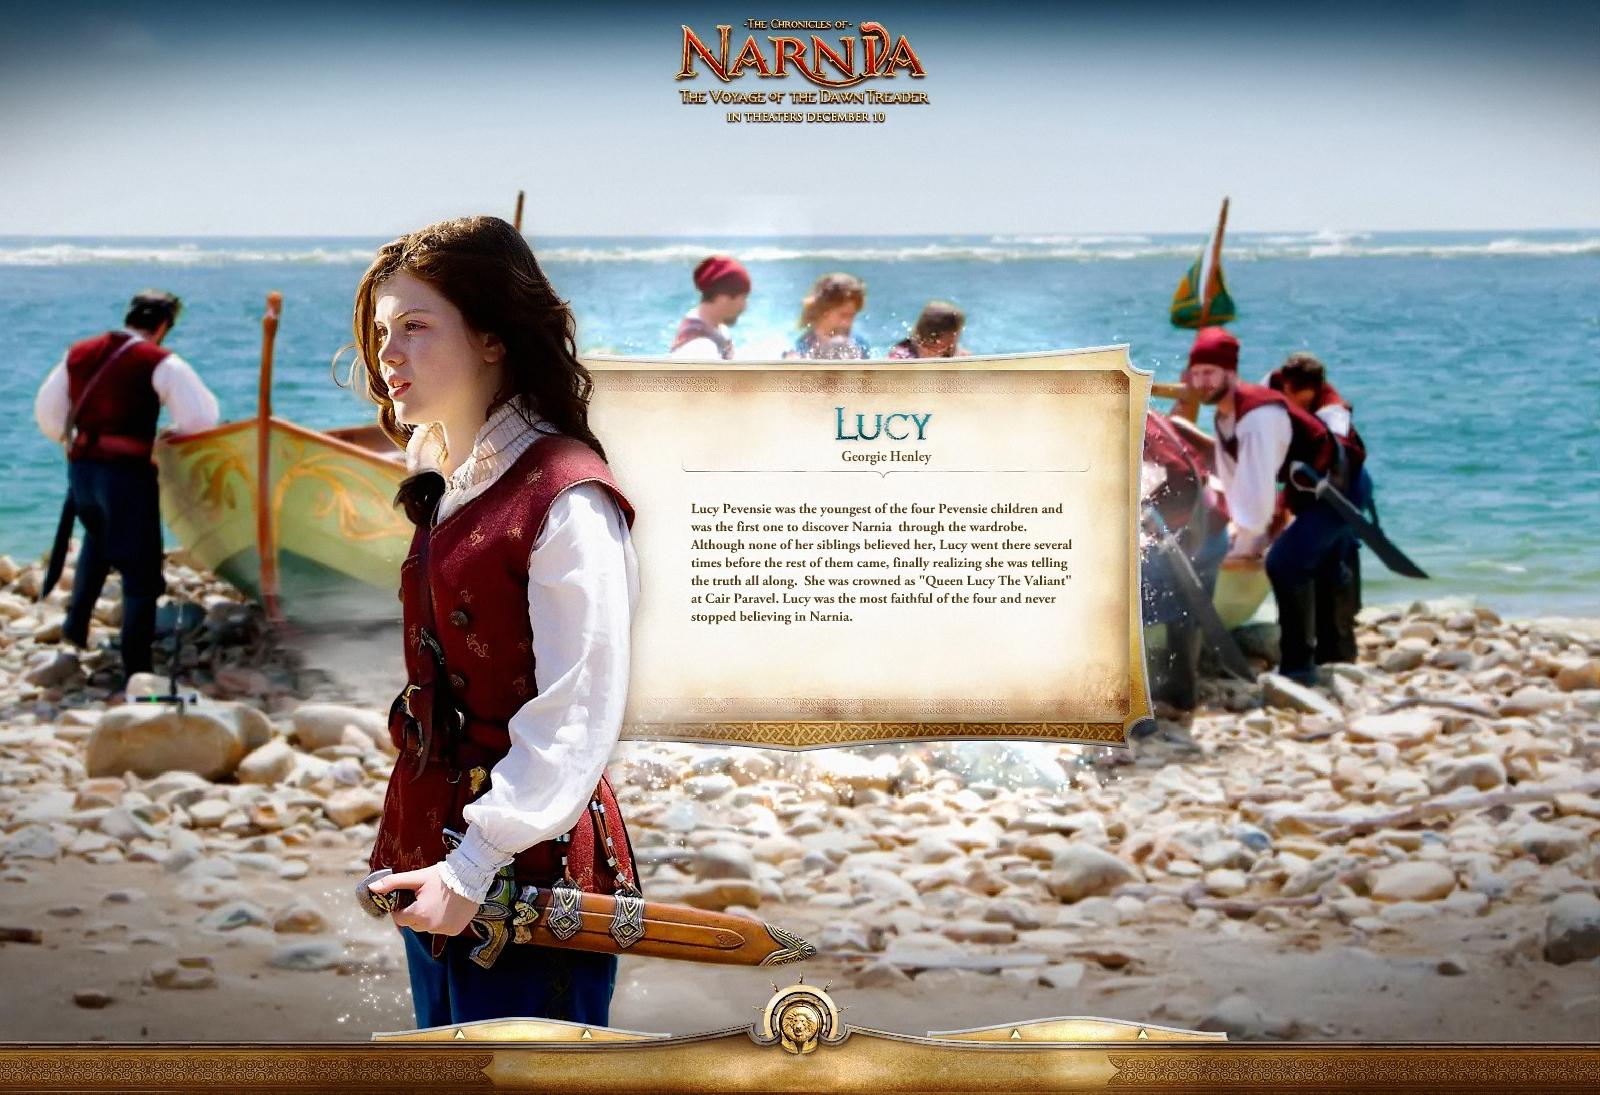 http://1.bp.blogspot.com/_-EeC3tFy8xI/TPscwaWCylI/AAAAAAAAALQ/SteMCZWxeVI/s1600/%2528220910214908%2529The_Chronicles_of_Narnia-+The_Voyage_of_the_Dawn_Treader_wallpaper_3.jpg